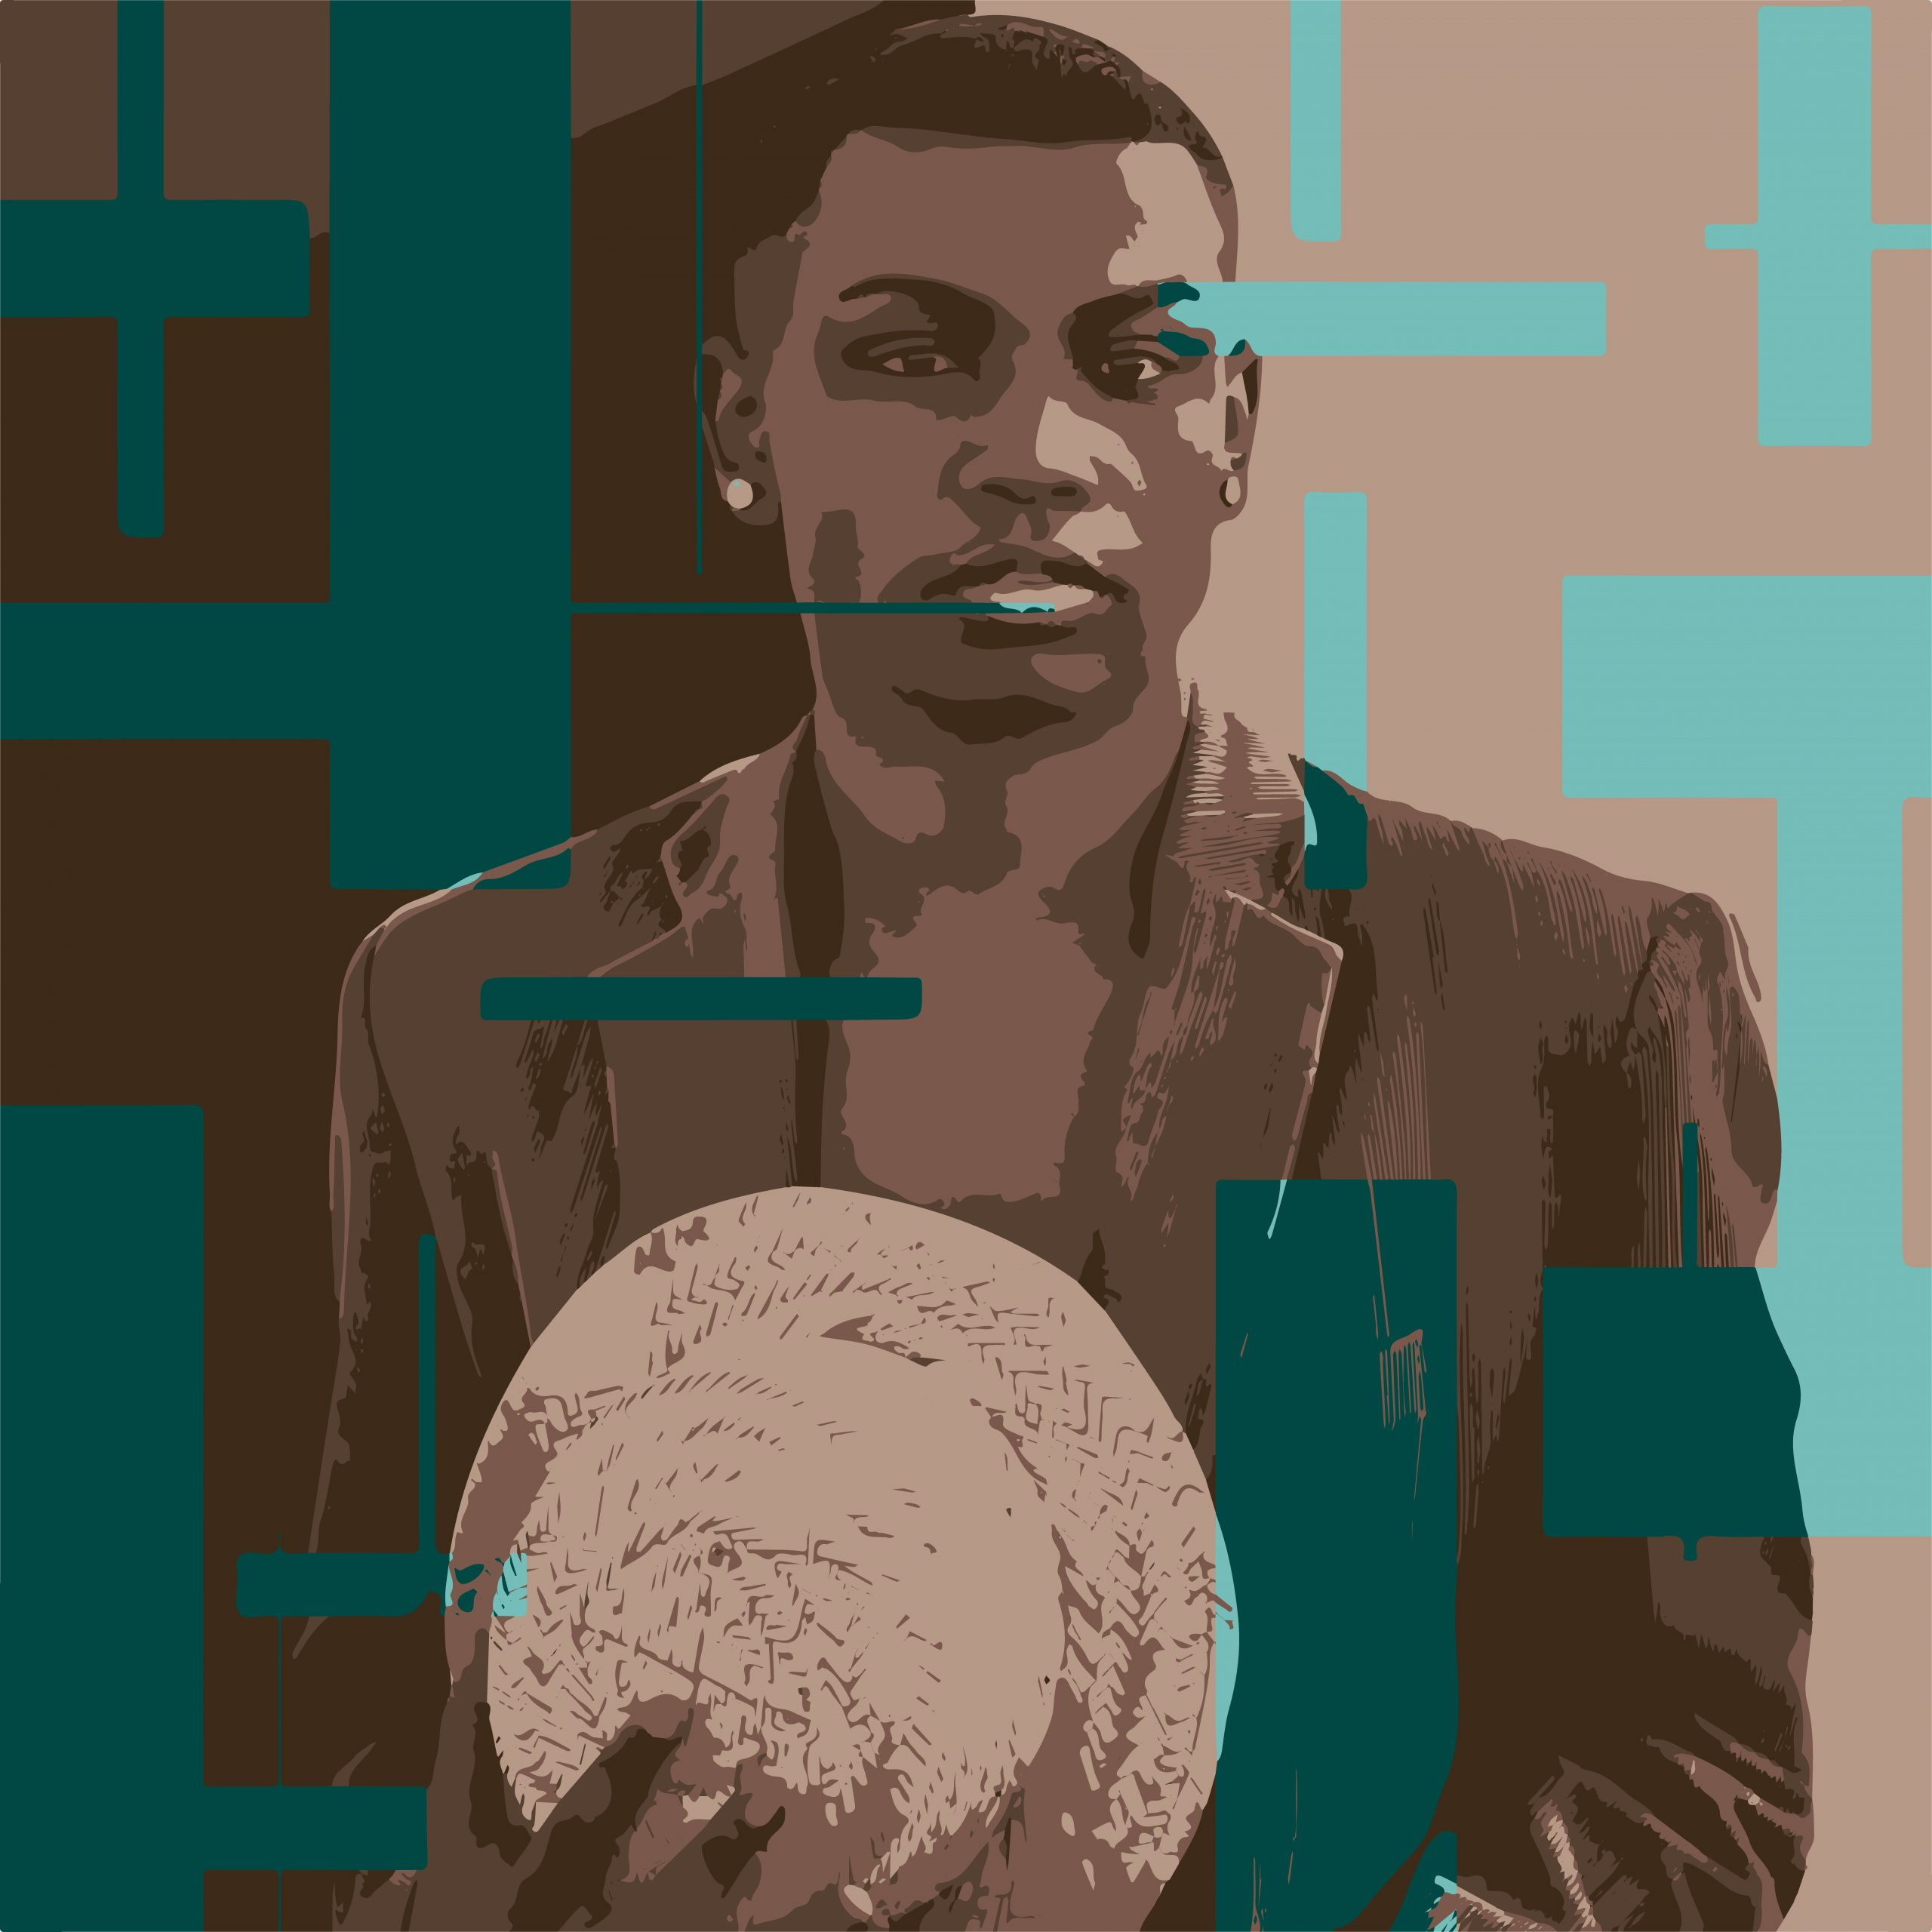 Illustration portrait of an African man